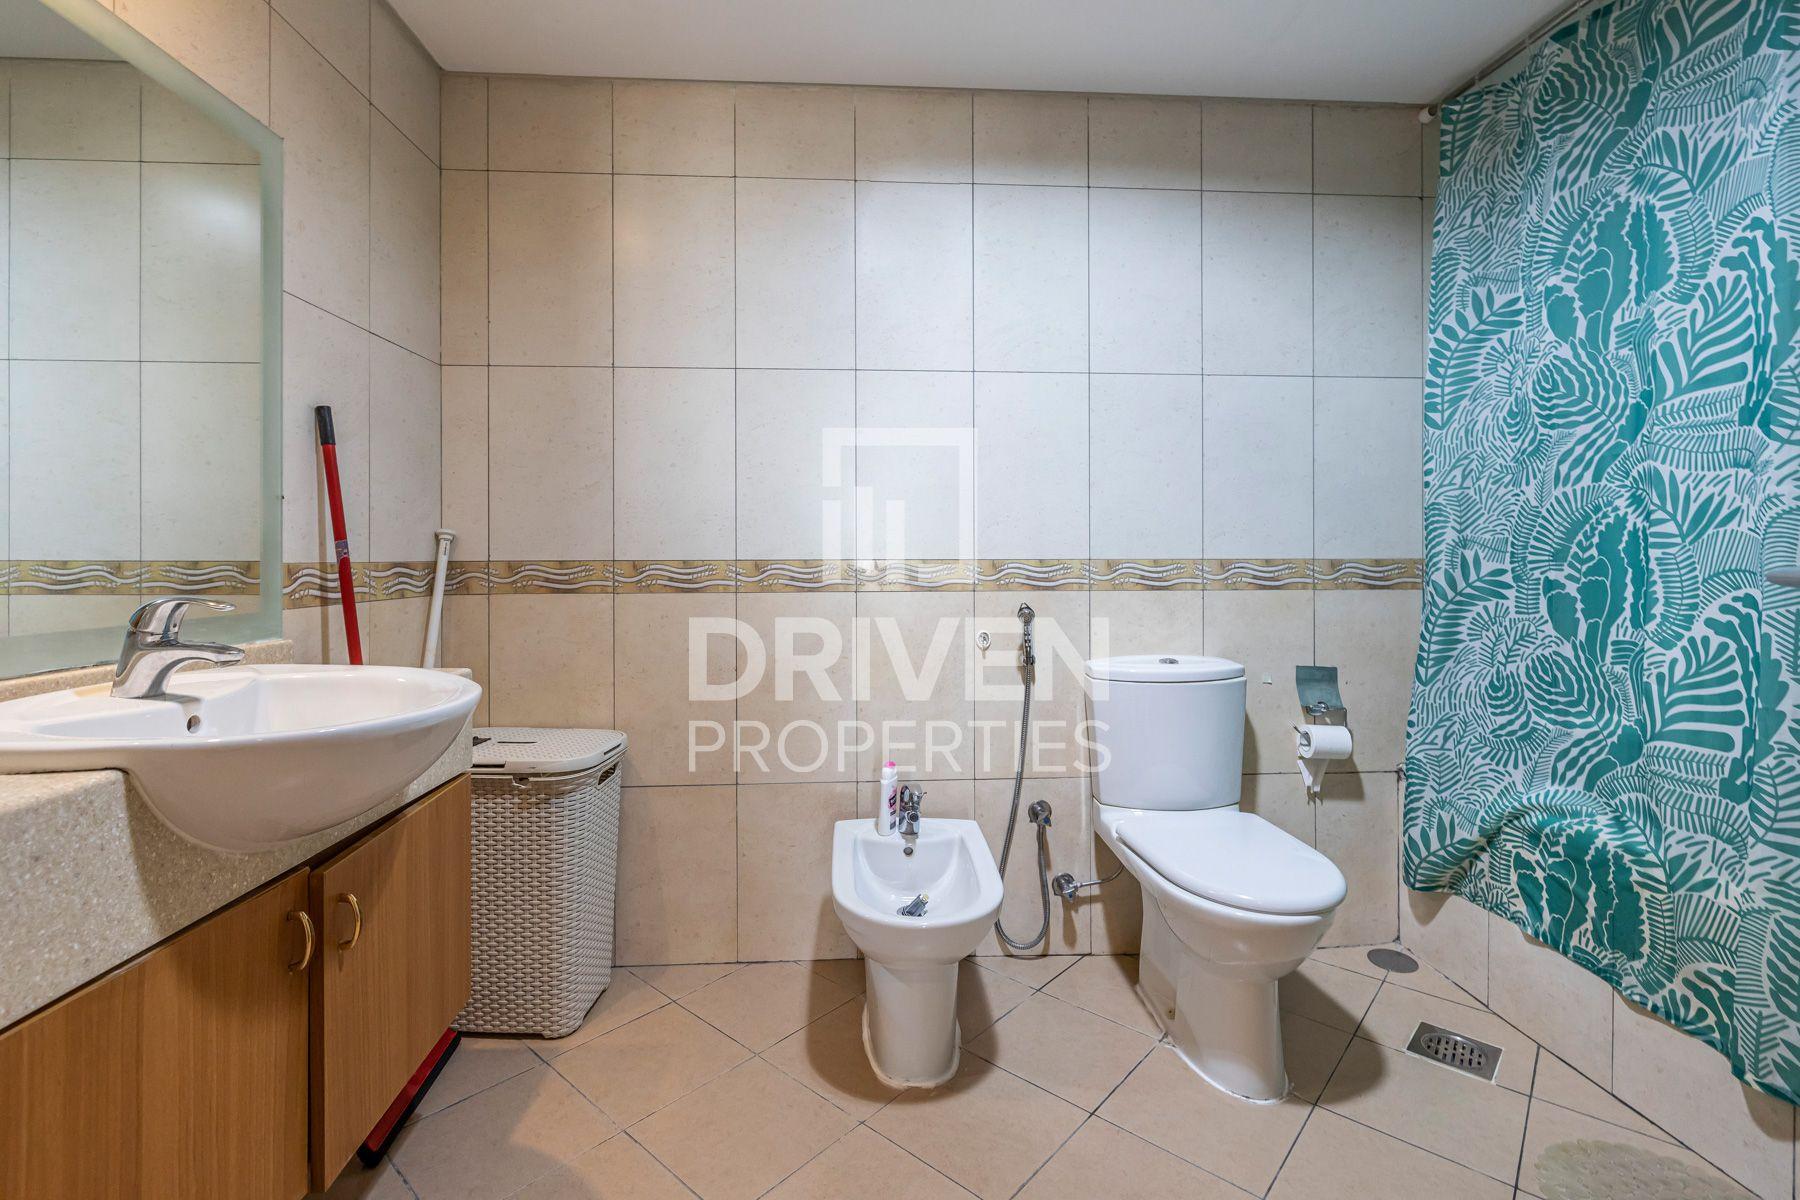 Apartment for Sale in Spring Oasis - Dubai Silicon Oasis